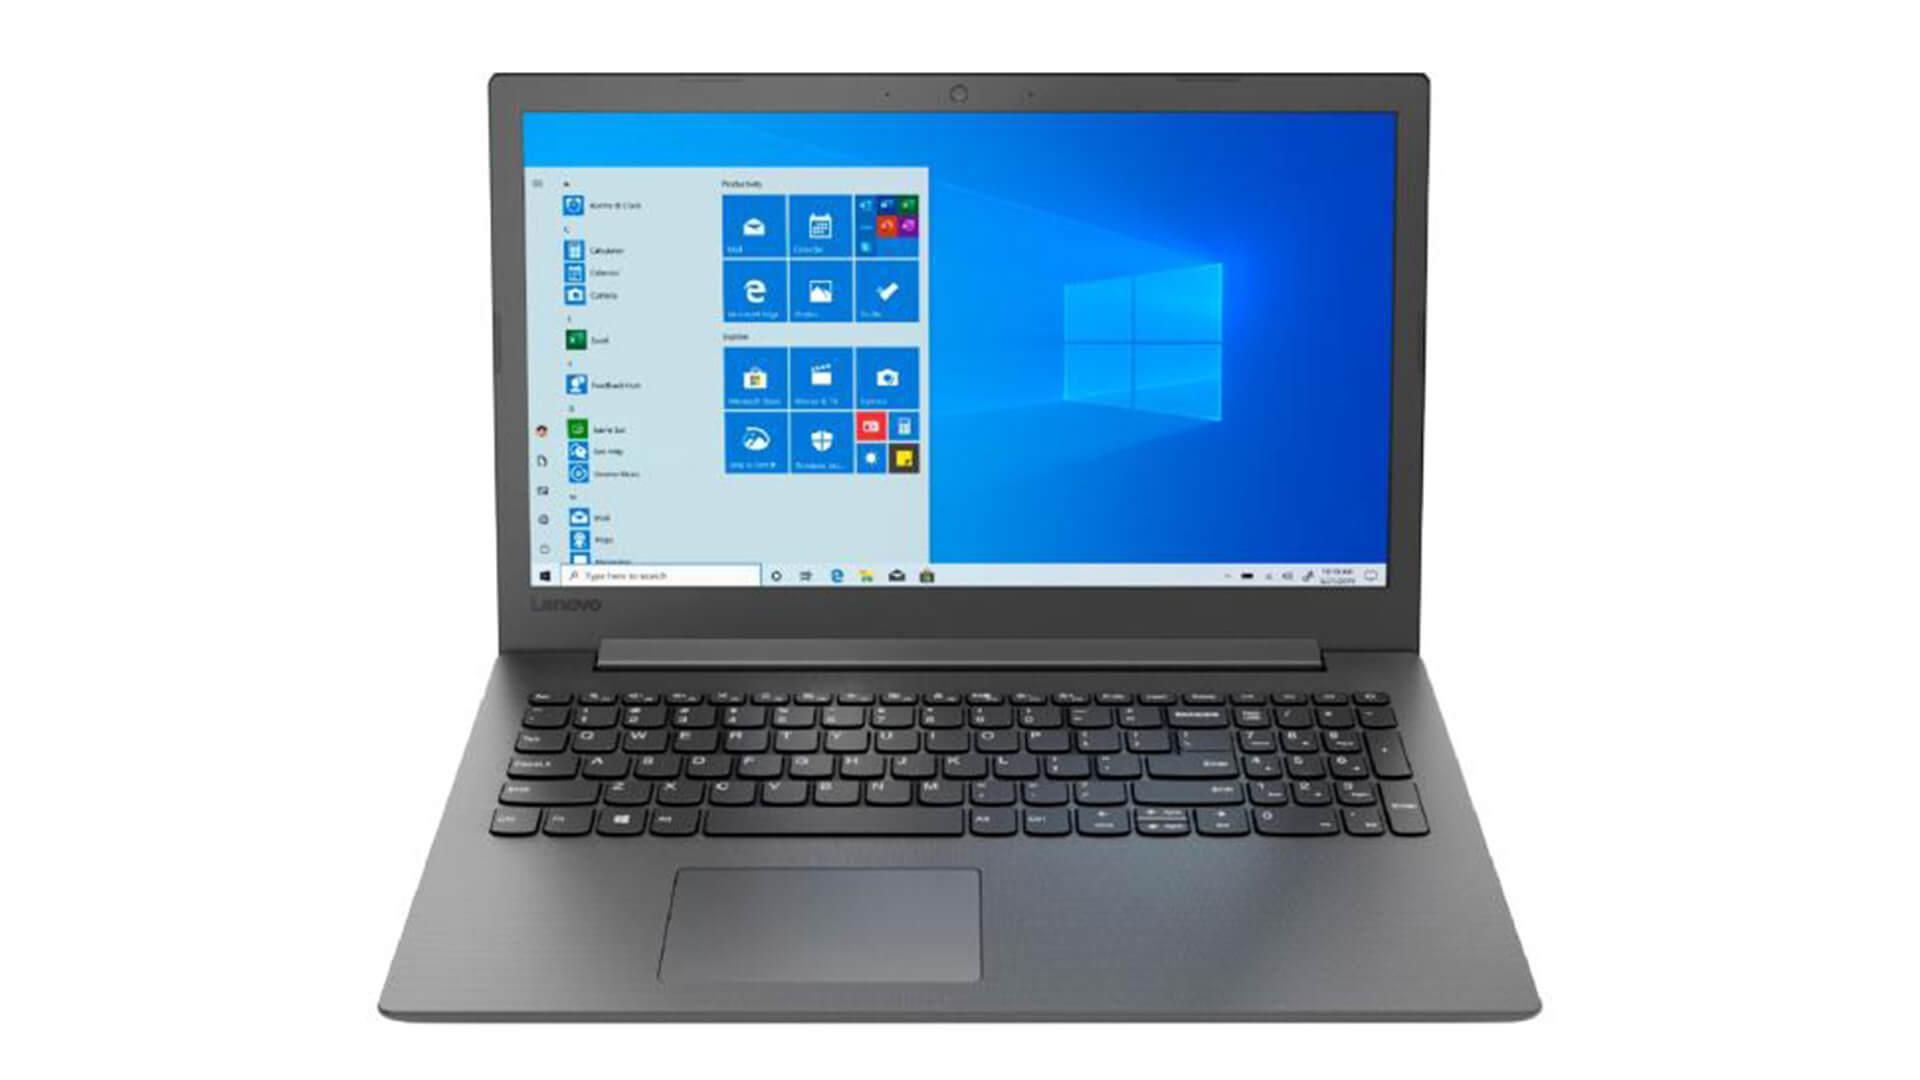 لپ تاپ لنوو Ideapad 130 - PA